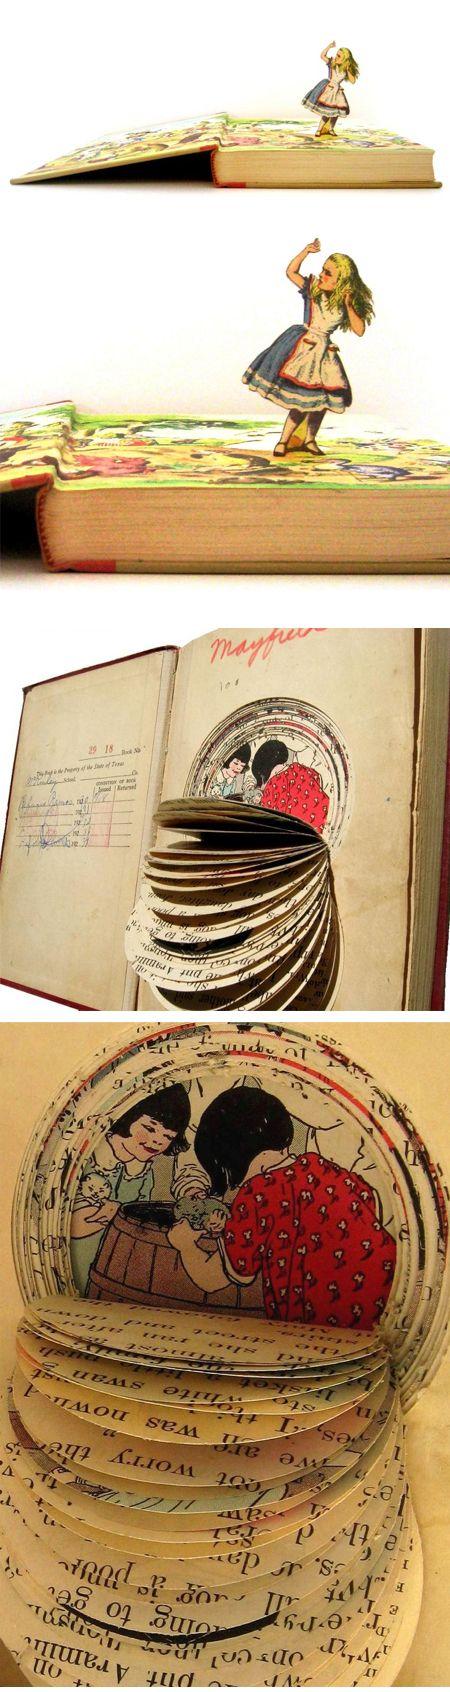 Jennifer Khoshbin  A very interesting take on vintage books... love it!